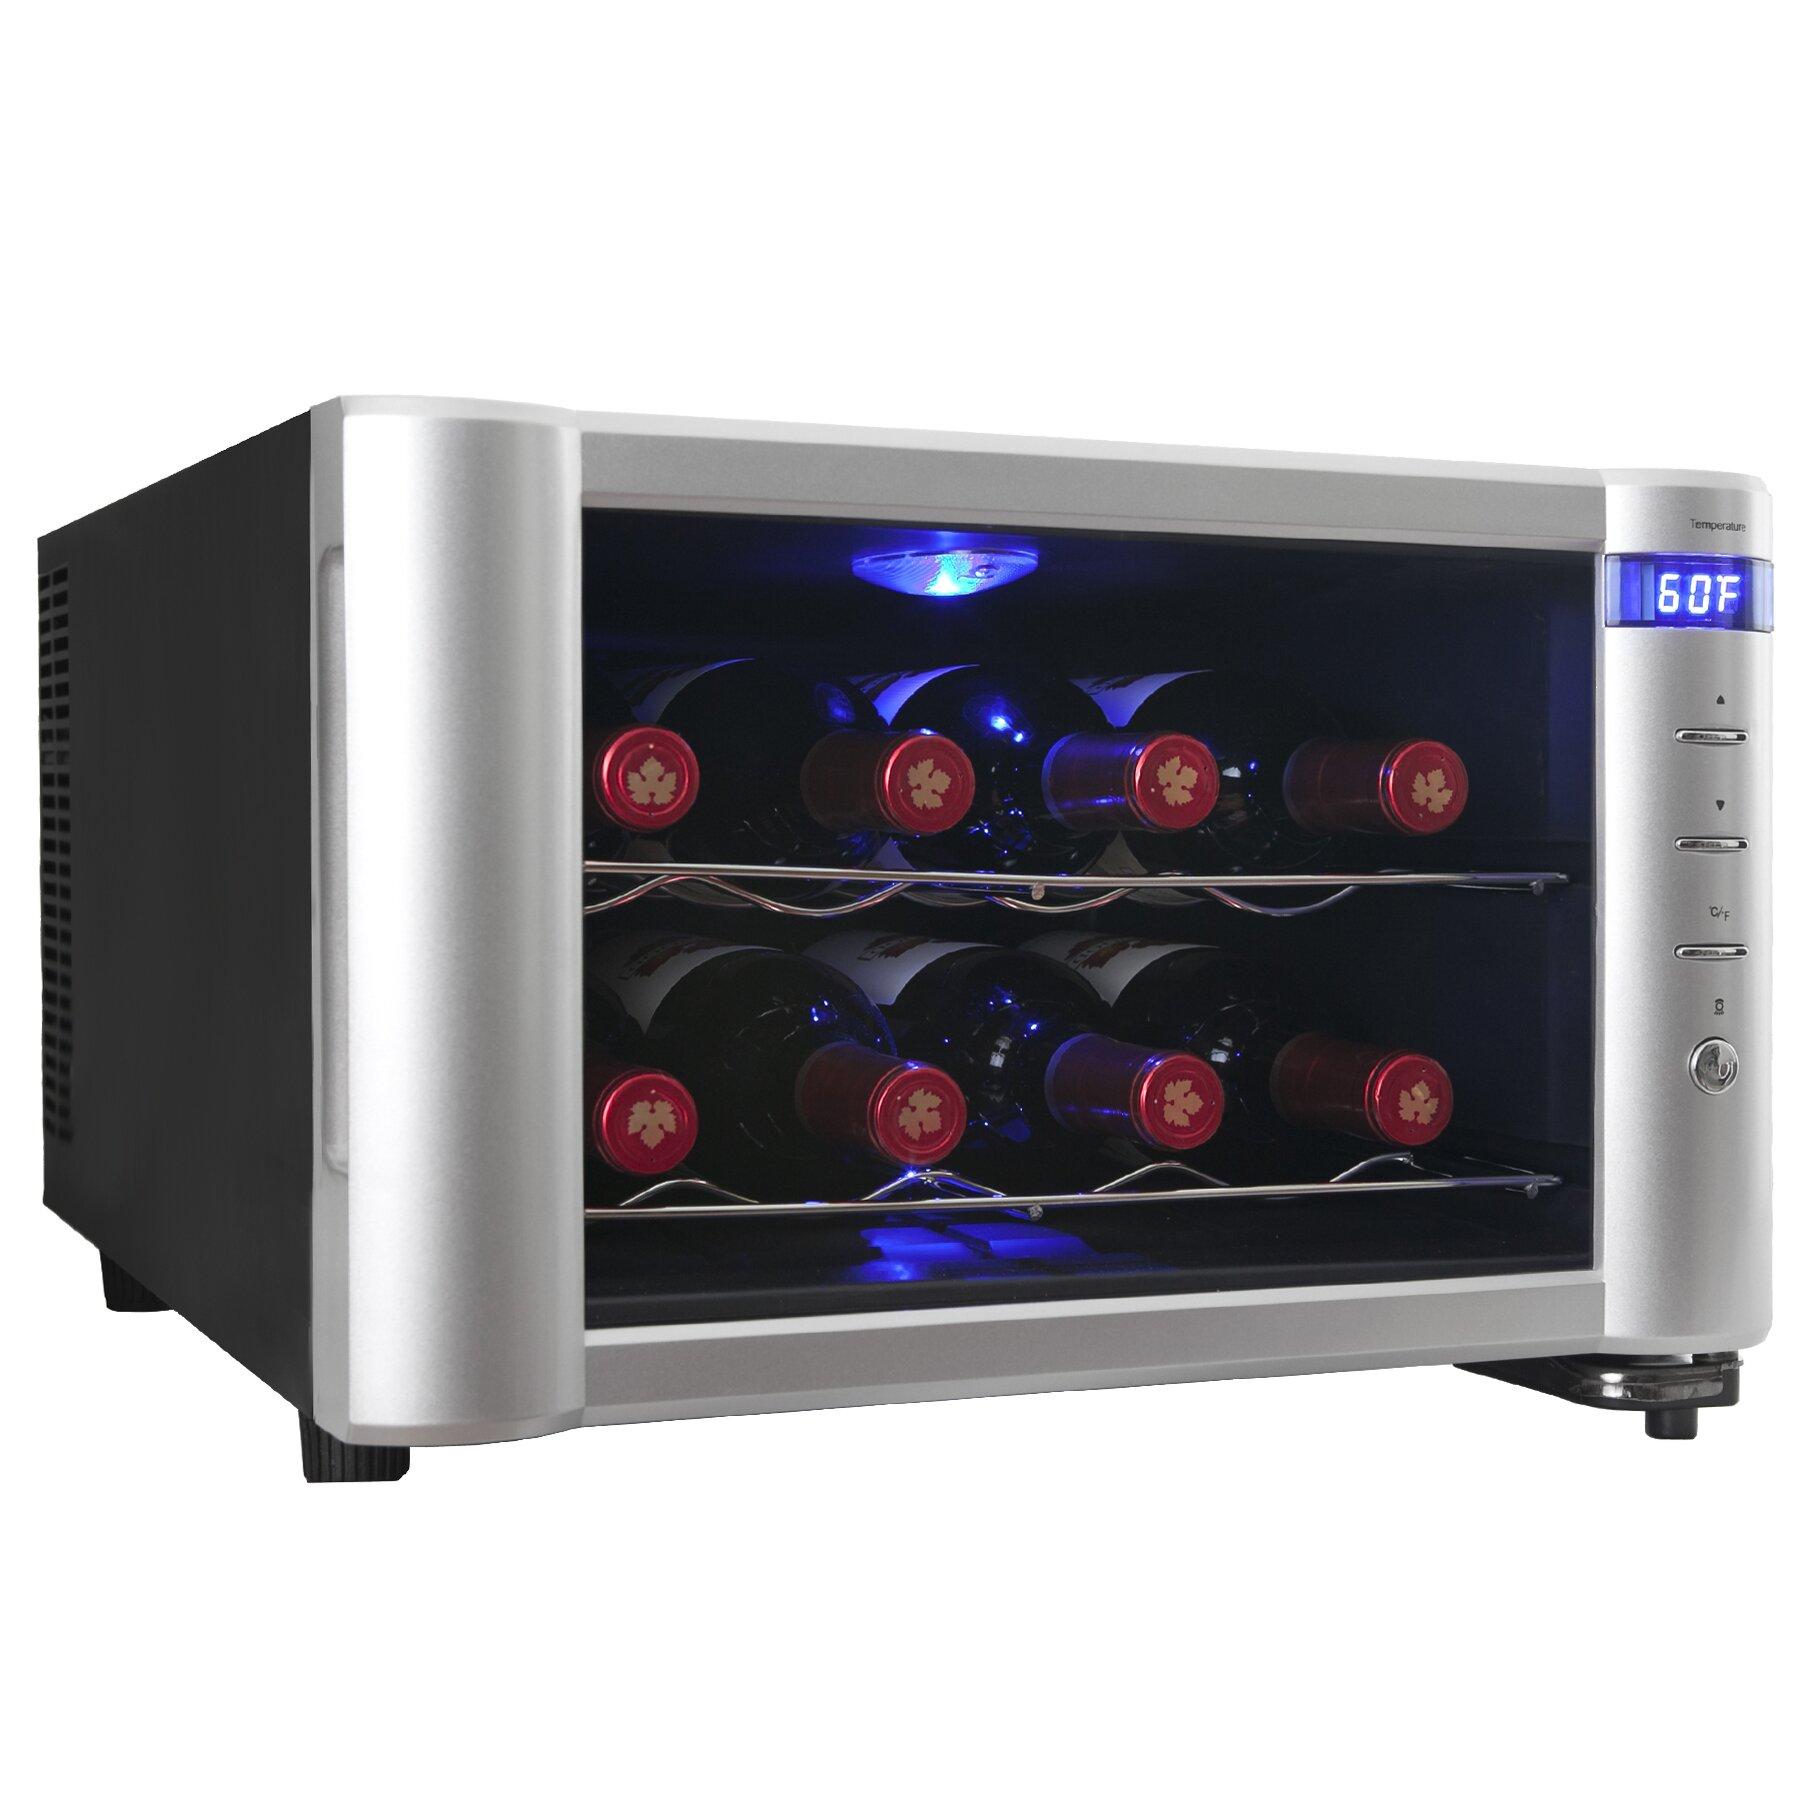 AKDY 8 Bottle Single Zone Freestanding Wine Cooler & Reviews   Wayfair